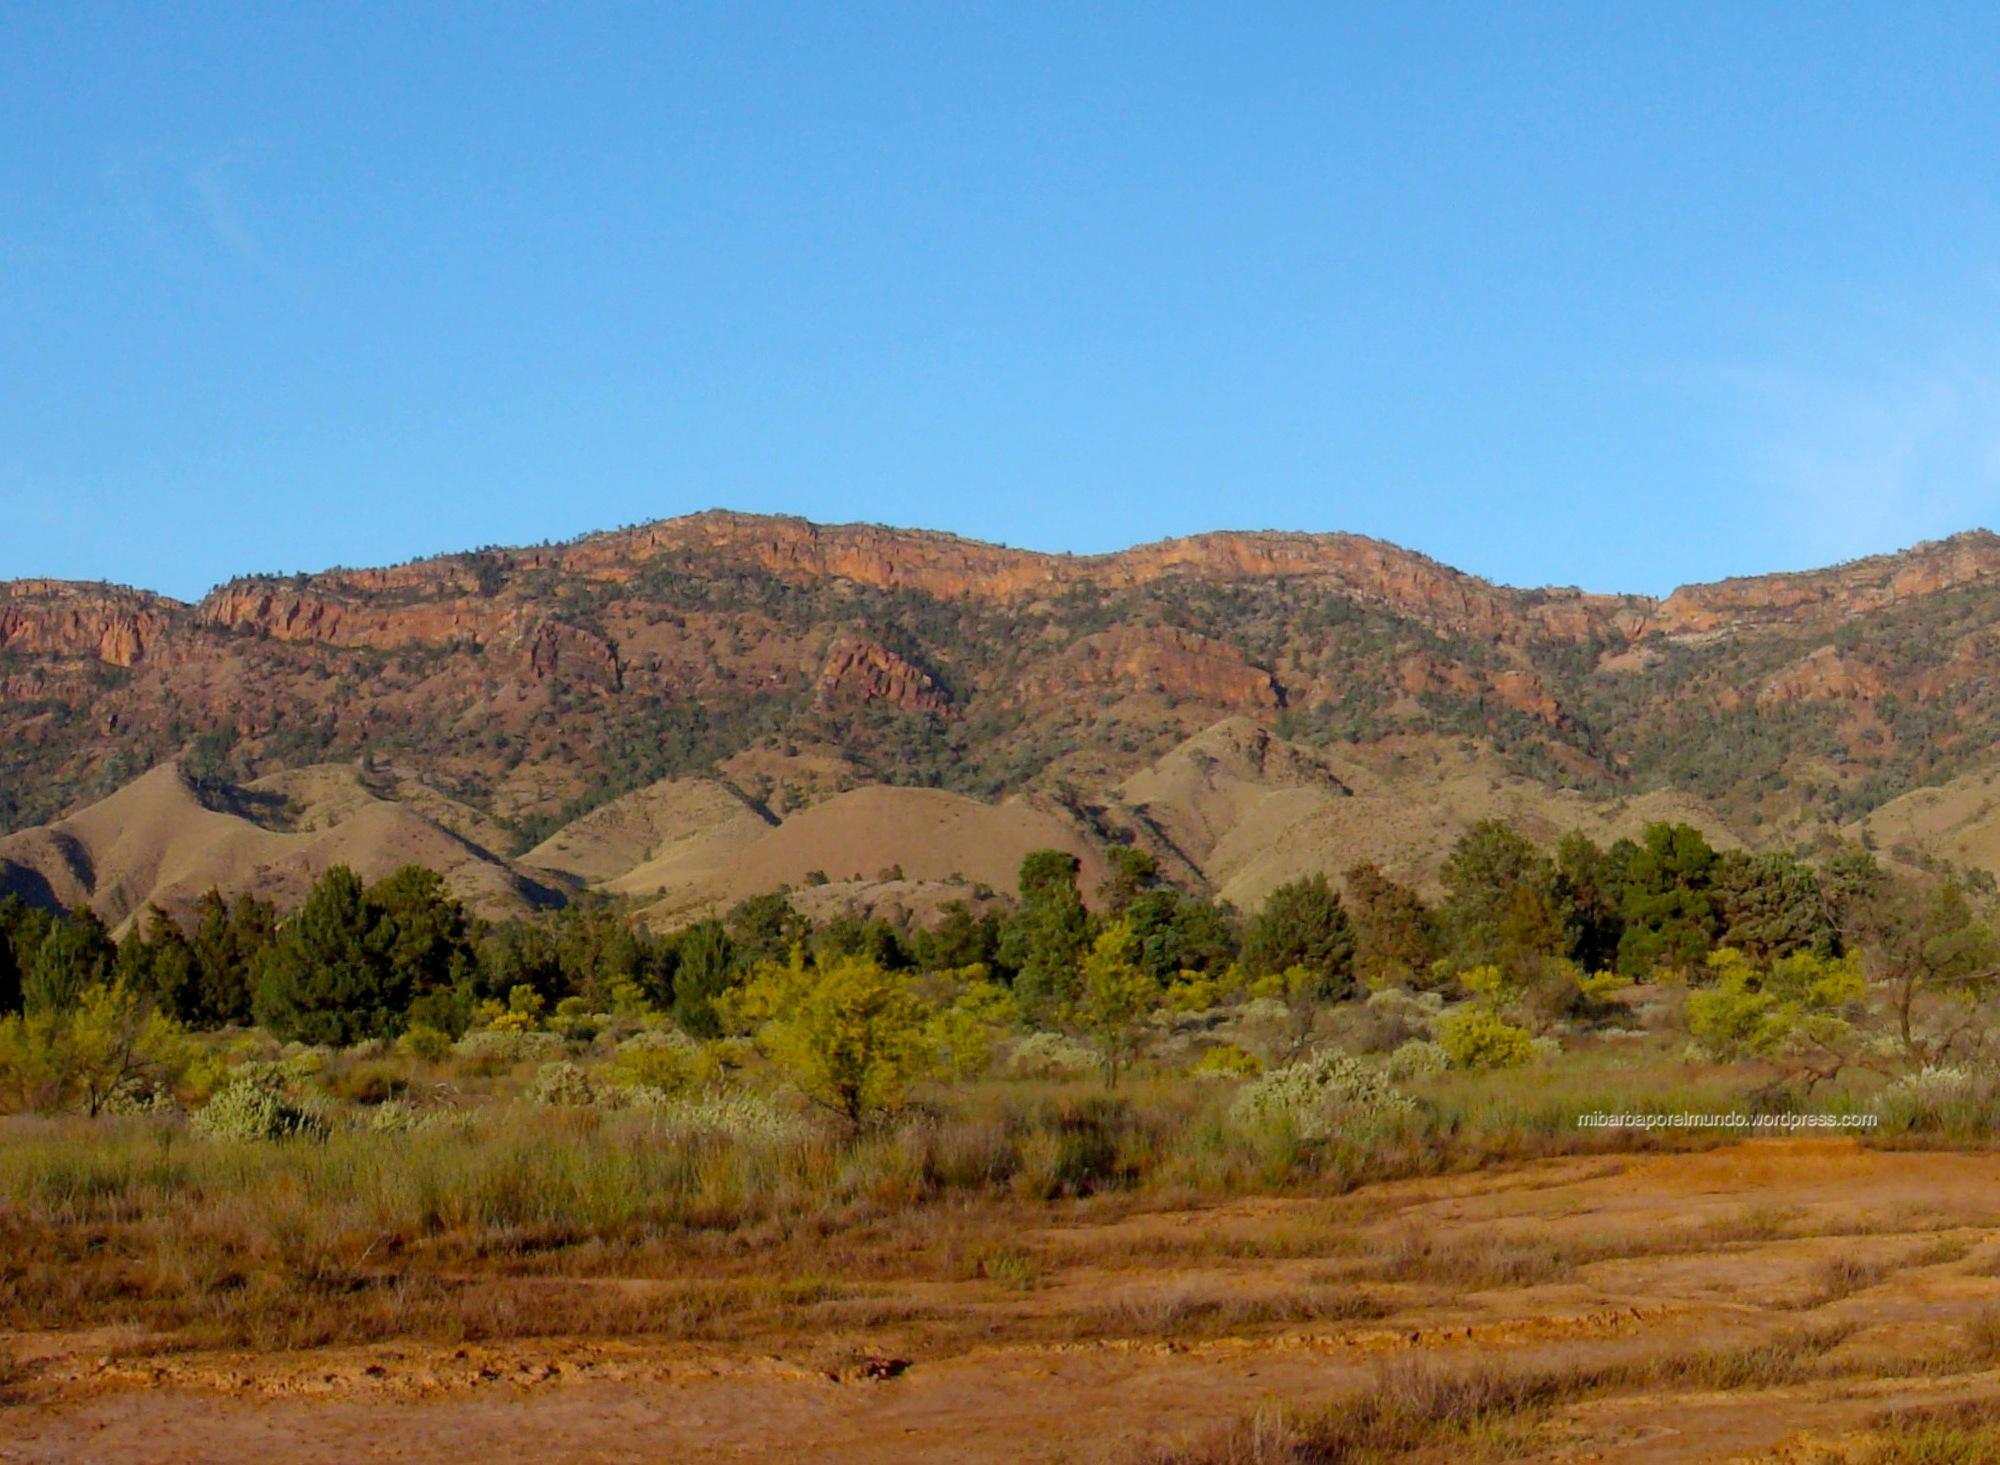 Heysen Trail - Outback